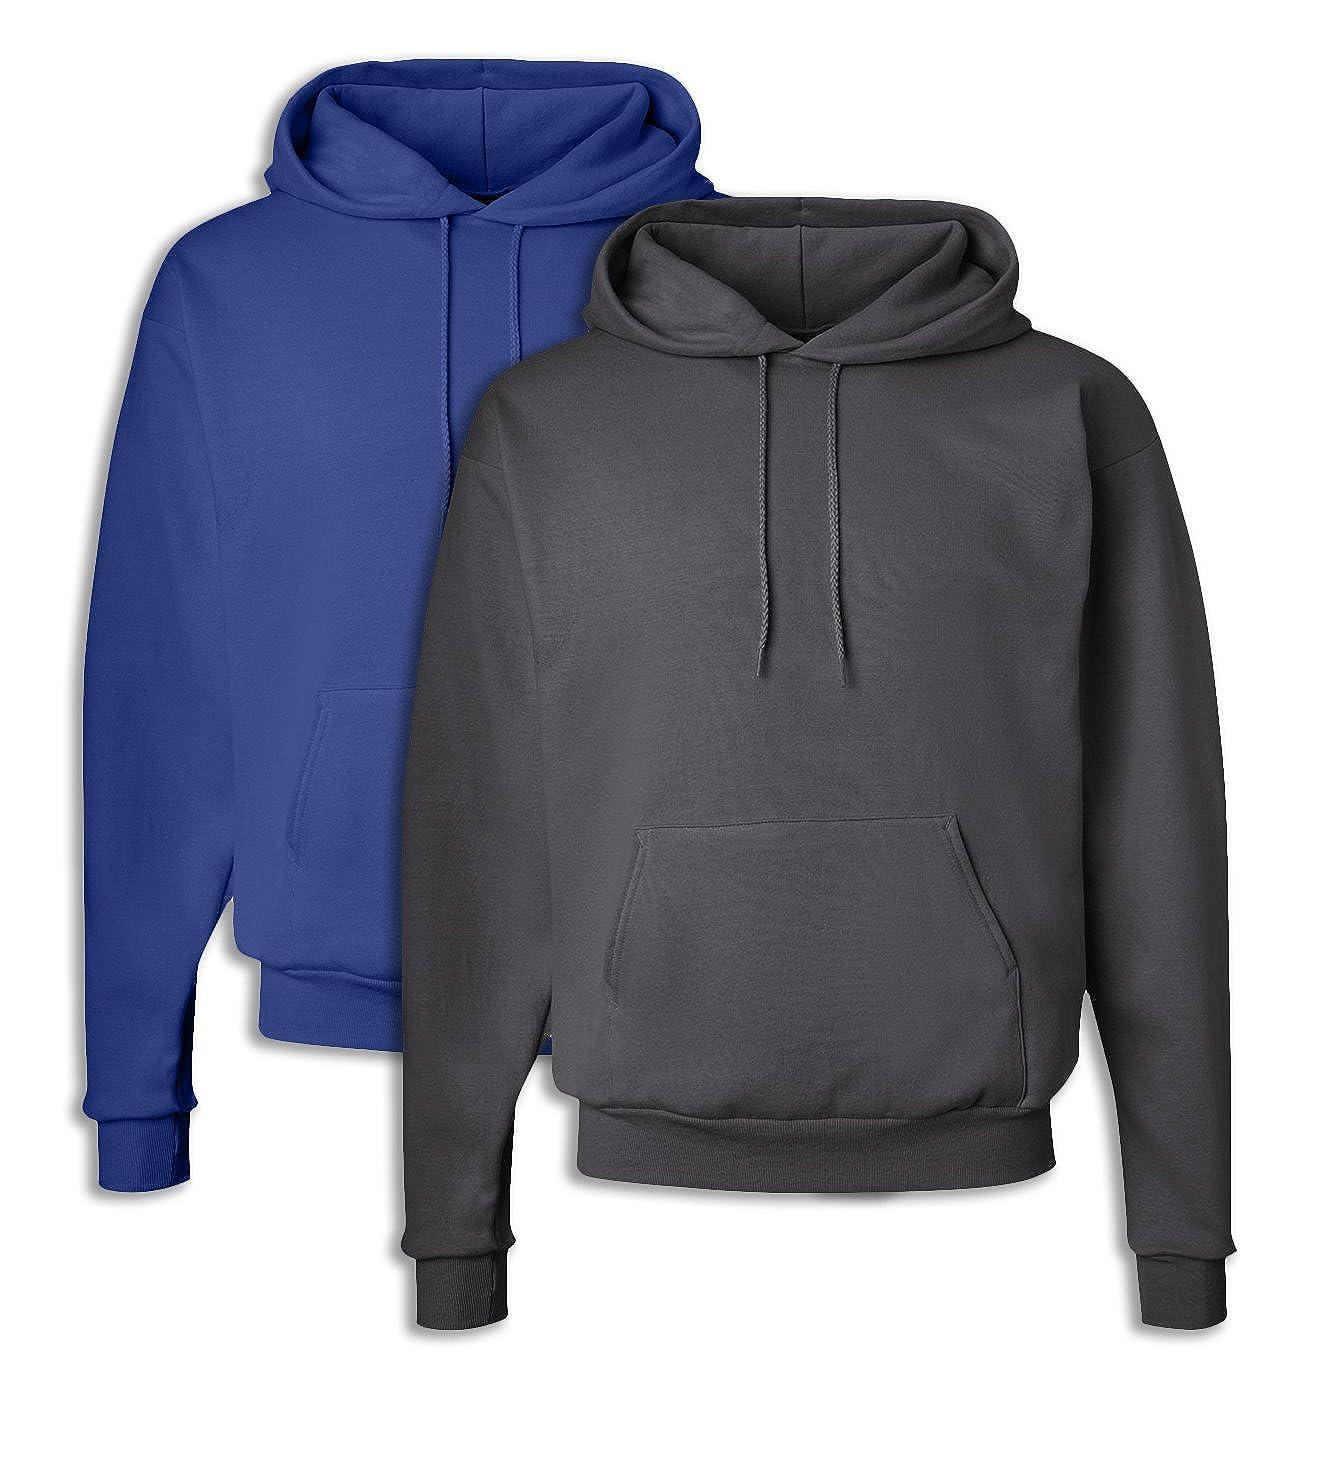 Hanes P170 Mens EcoSmart Hooded Sweatshirt 2XL 1 Deep Royal 1 Smoke Grey